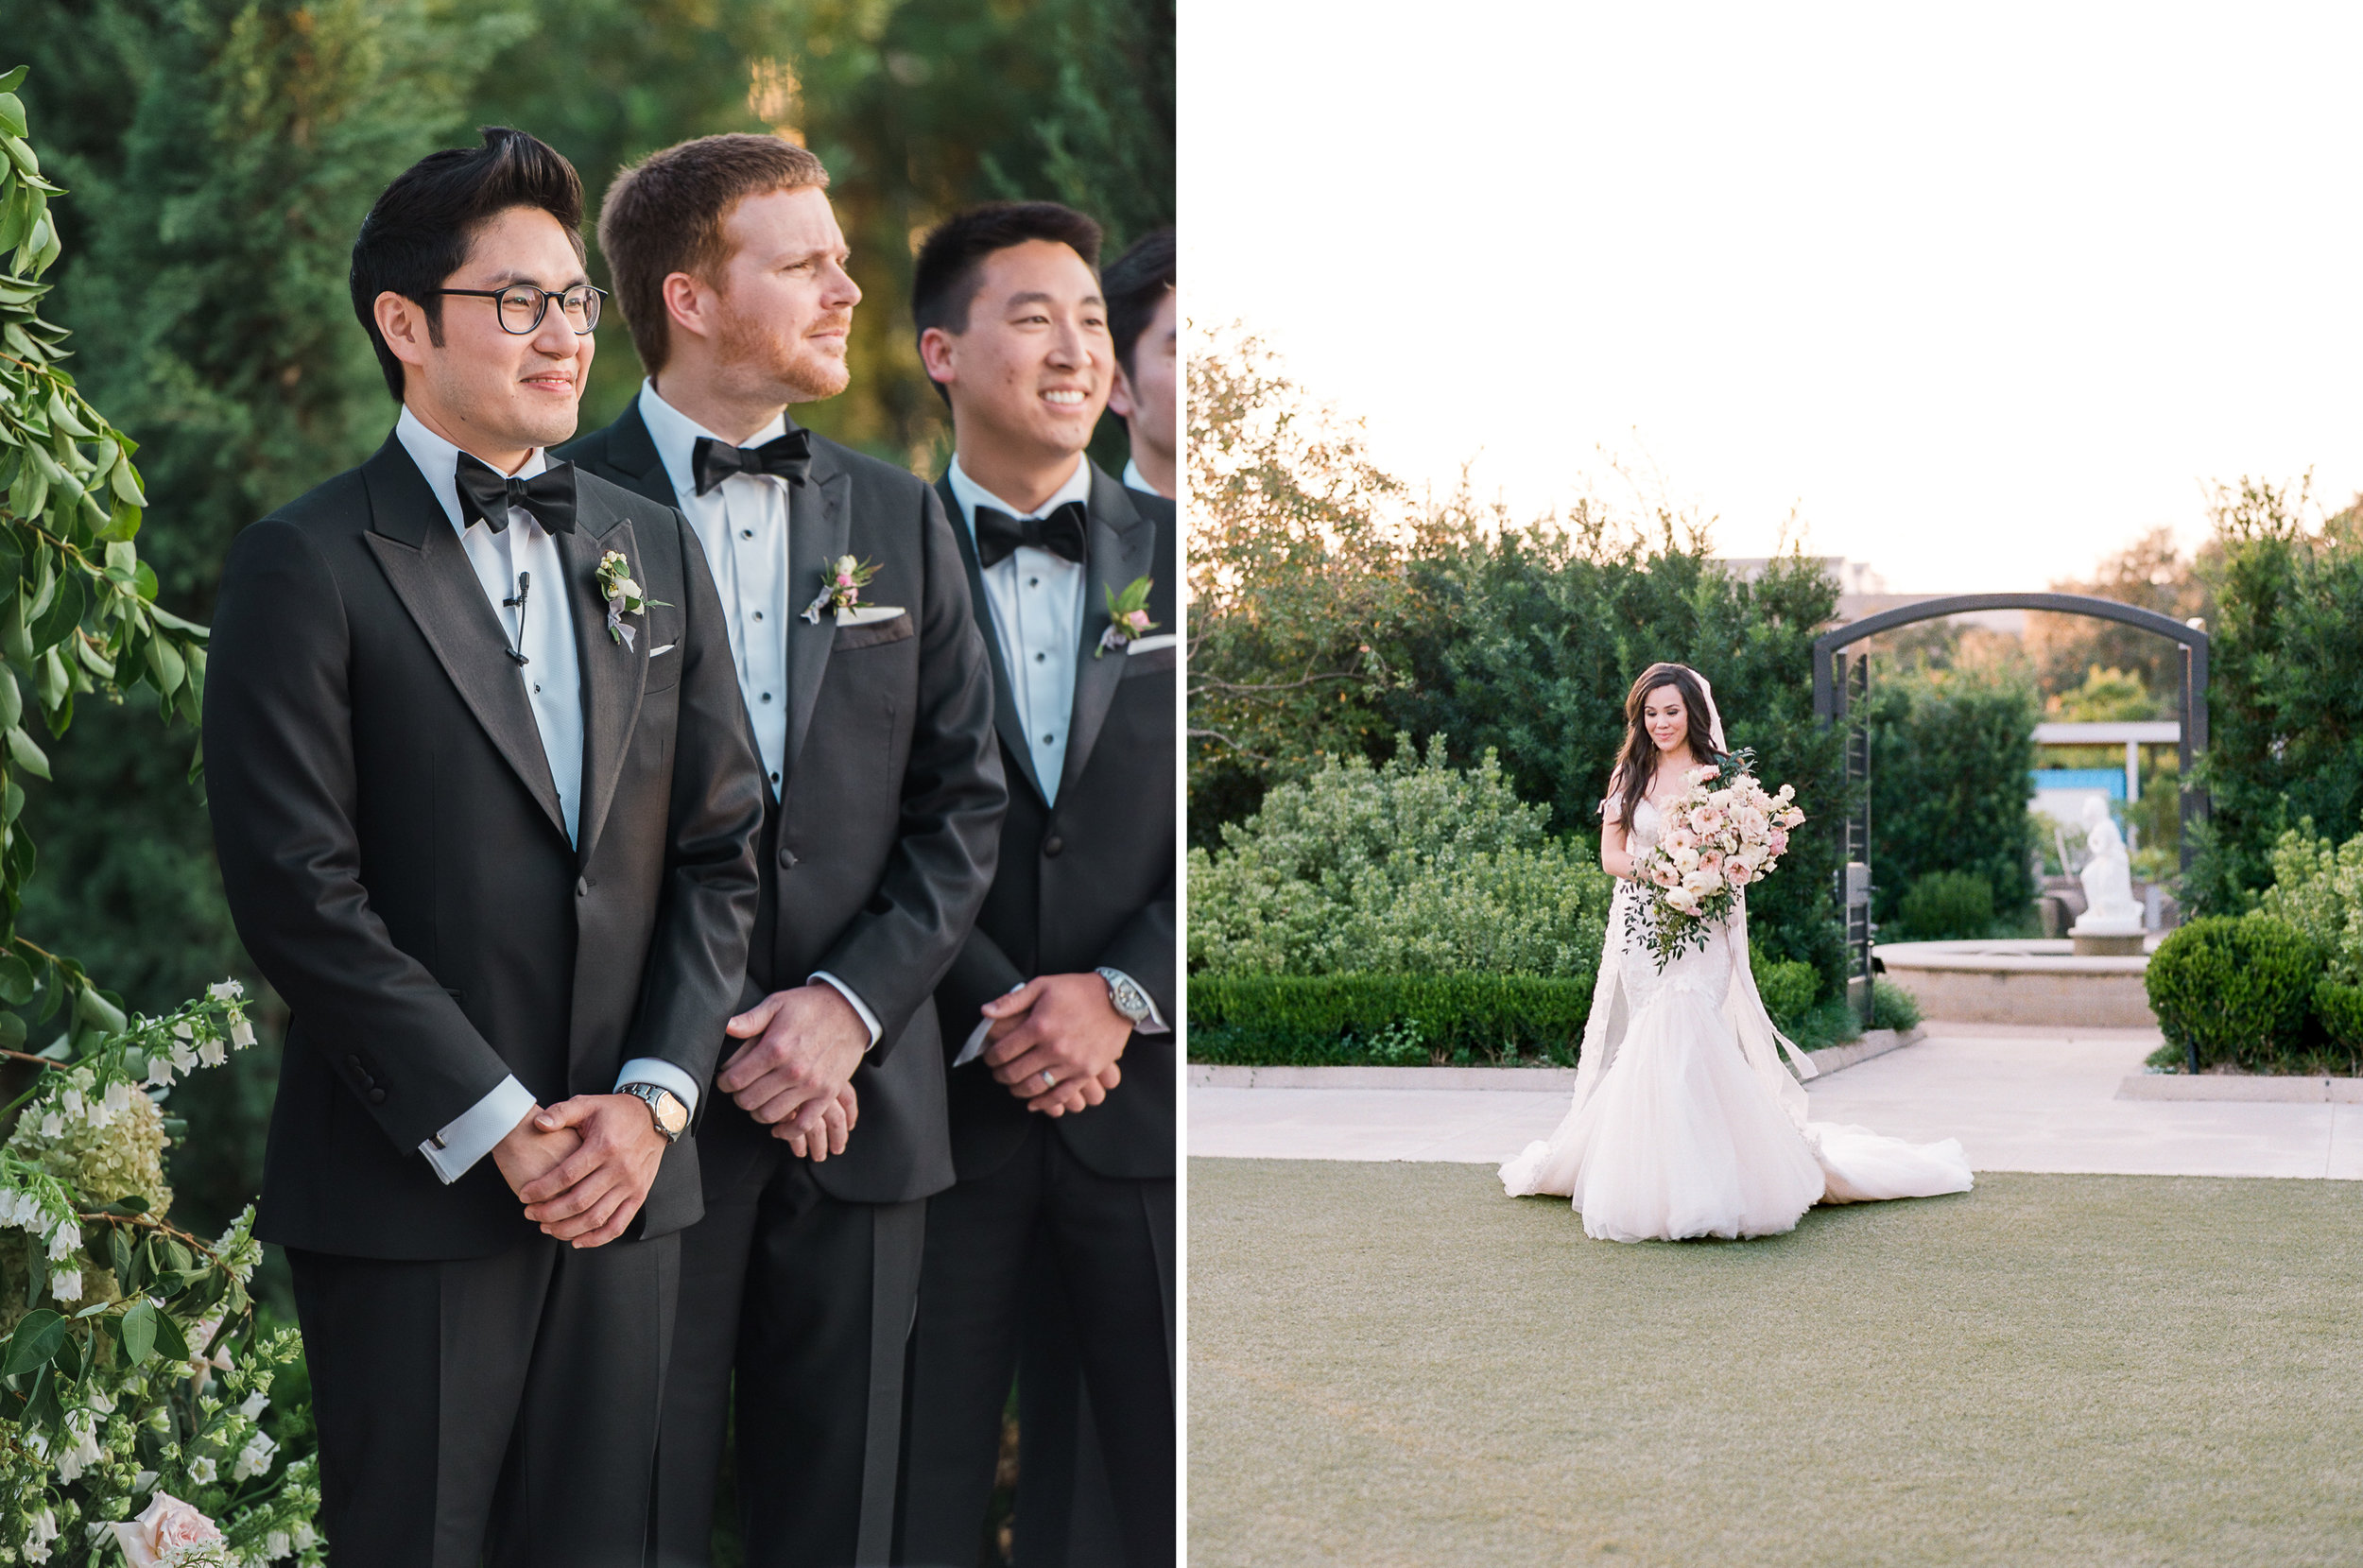 Martha-Stewart-Wedding-Dana-Fernandez-Photography-Josh-Texas-Film-Houston-Wedding-Fine-Art-Photographer-McGovern-Centennial-Gardens-Top-Best-209.jpg